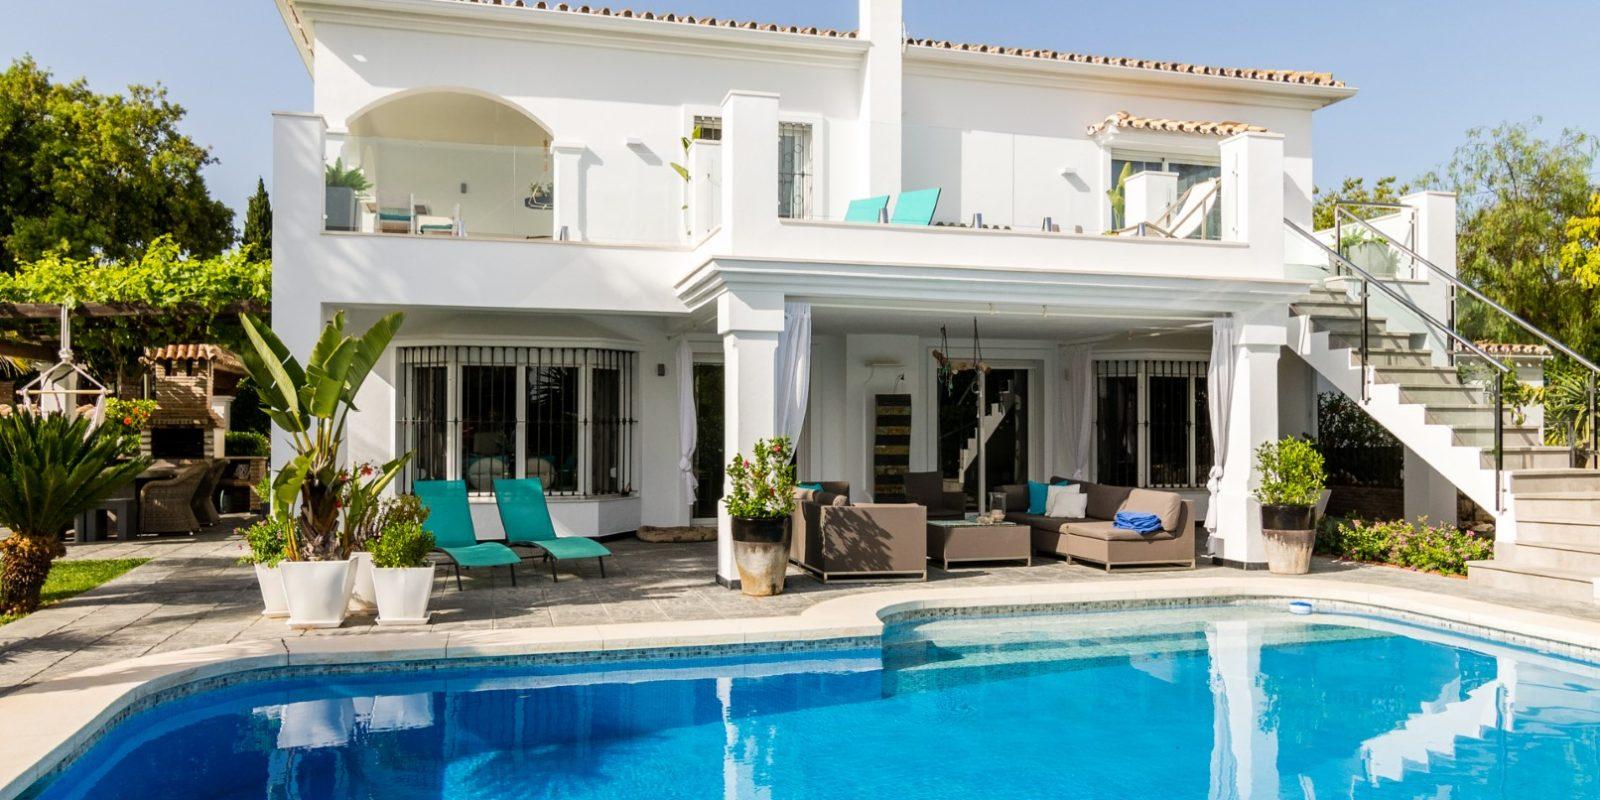 2017.06.01 - Just Rent Marbella - Villa Marlin - (1 of 6) (Large)